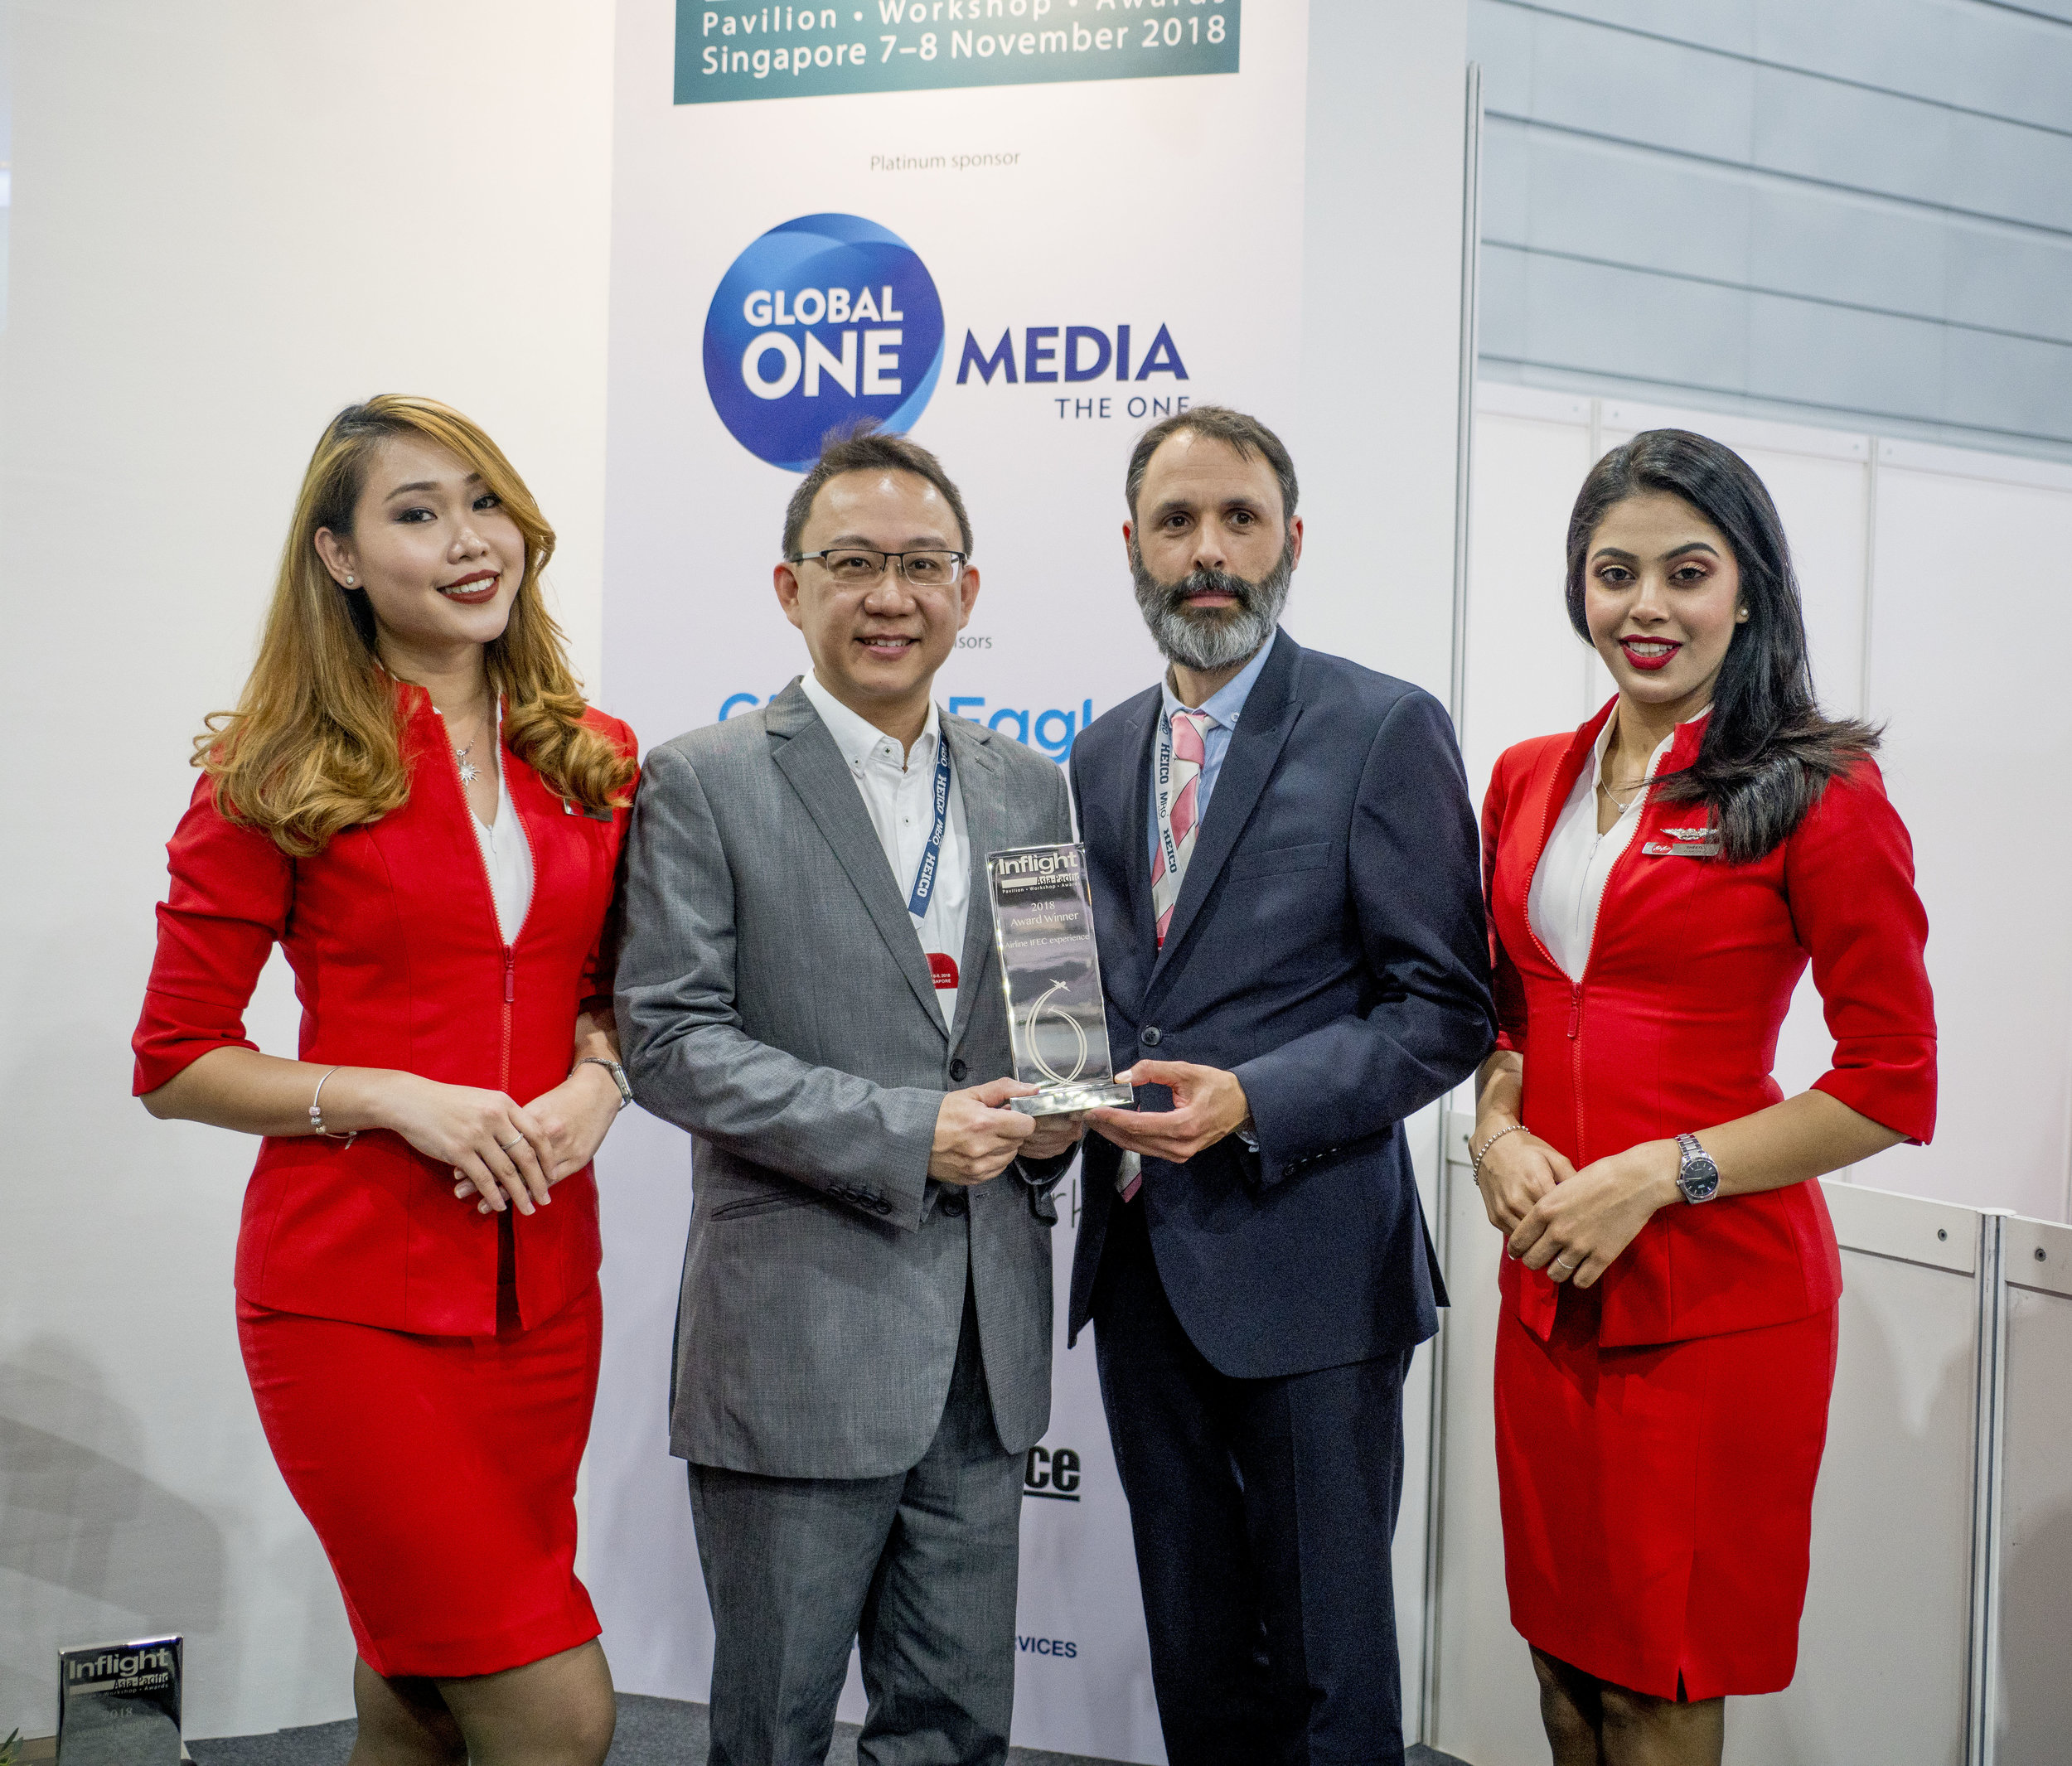 ROKKI首席技术执行员Edwin Ng(左二)从Inflight Magazine编辑Alexander Preston手中接过该奖项。